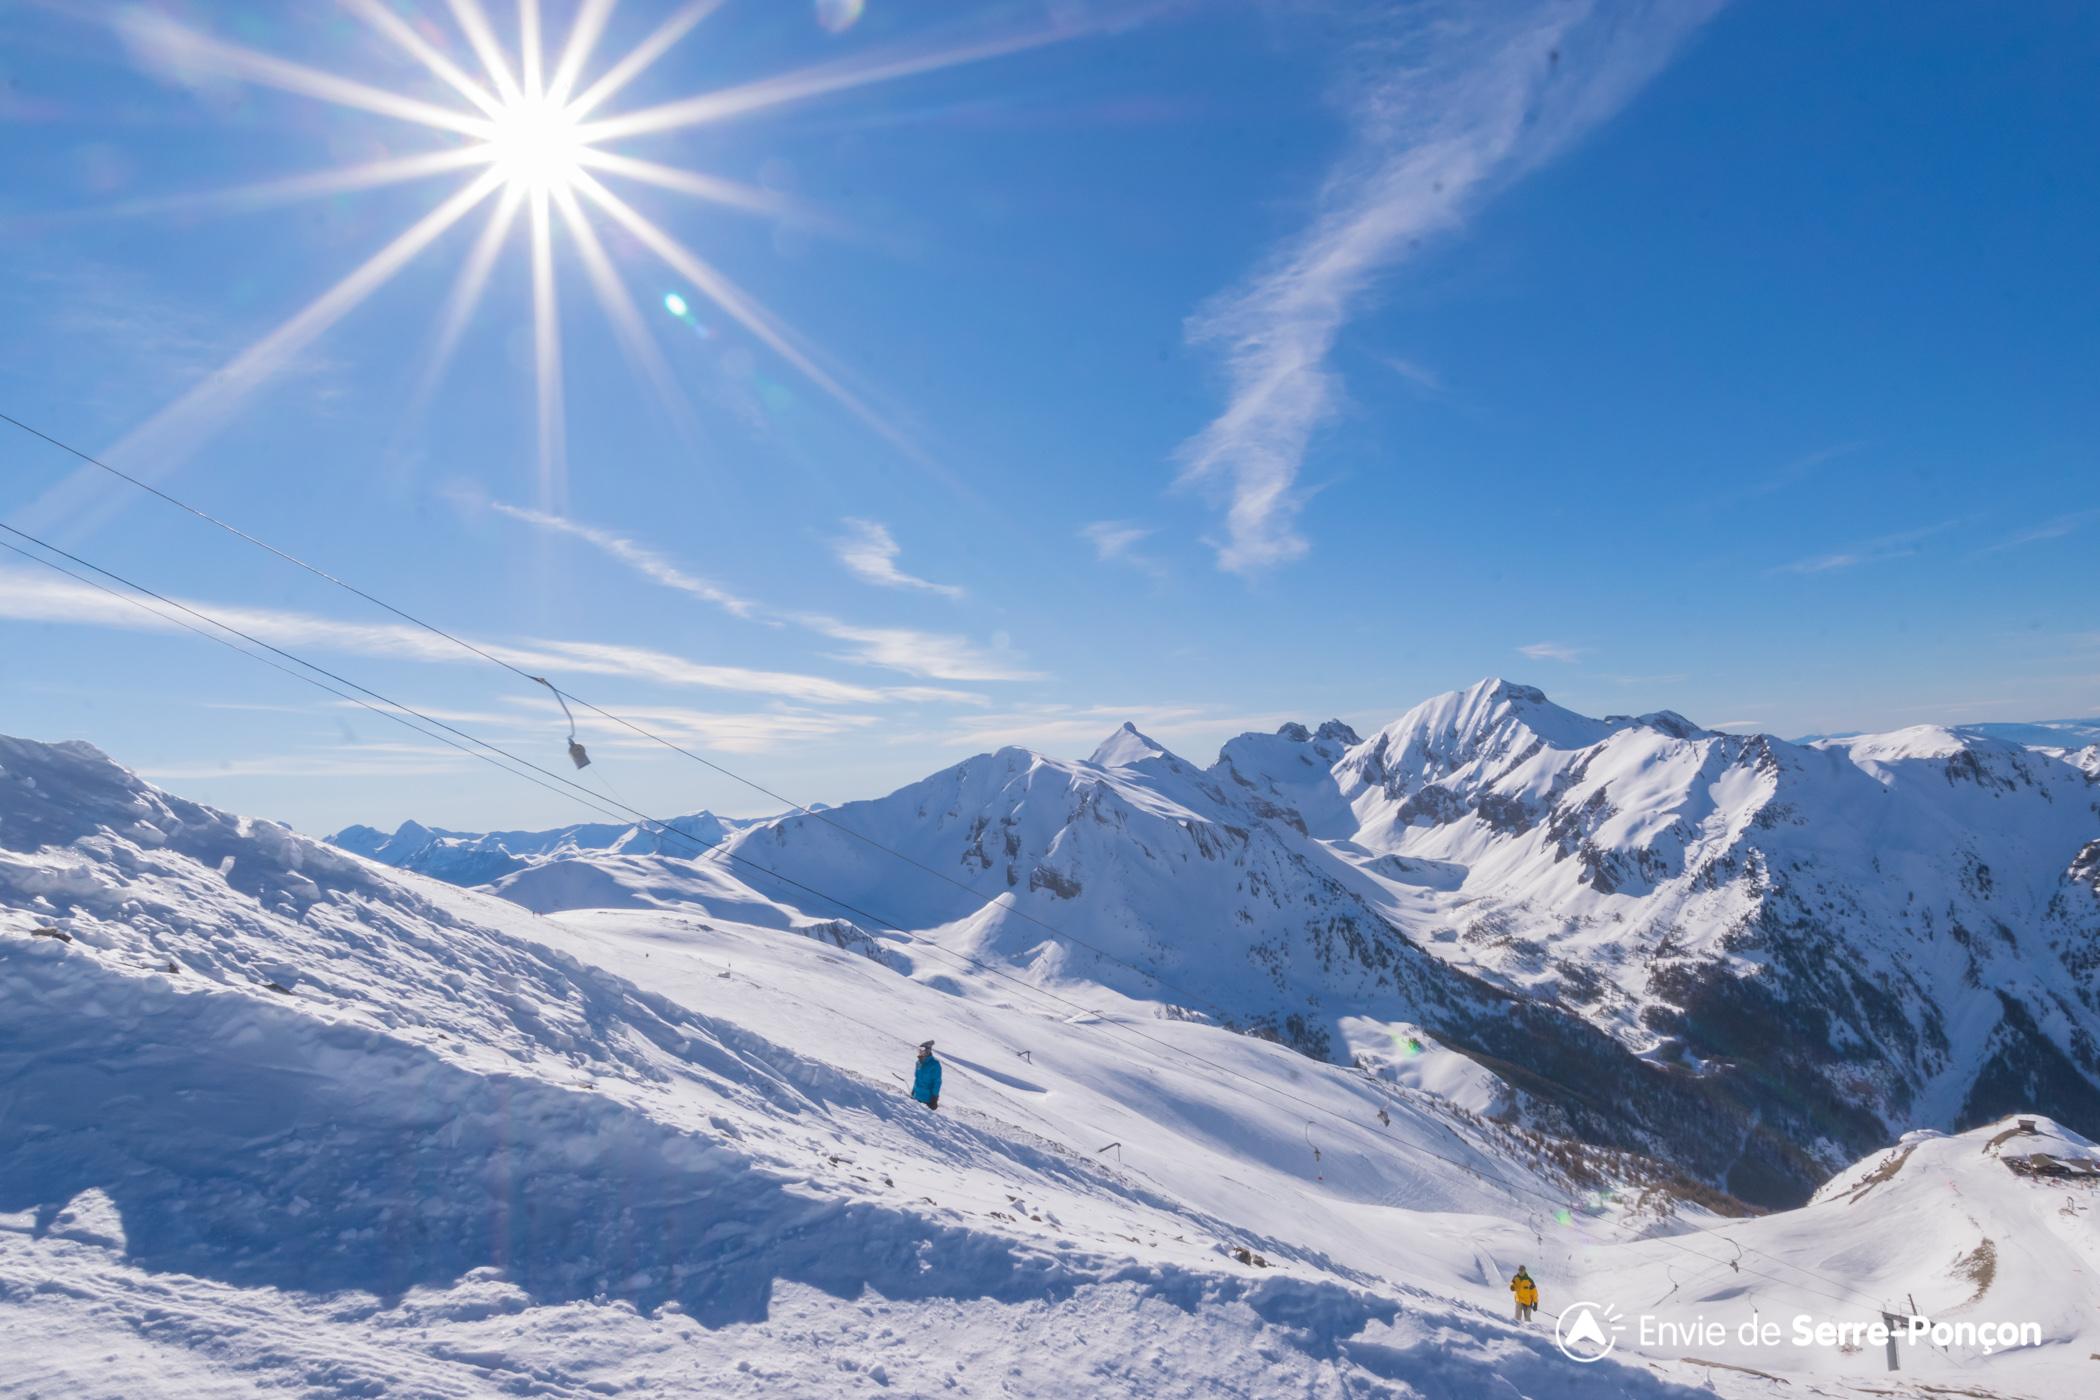 station de ski les orres embrun hautes alpes alpes du sud envie de serre pon on. Black Bedroom Furniture Sets. Home Design Ideas